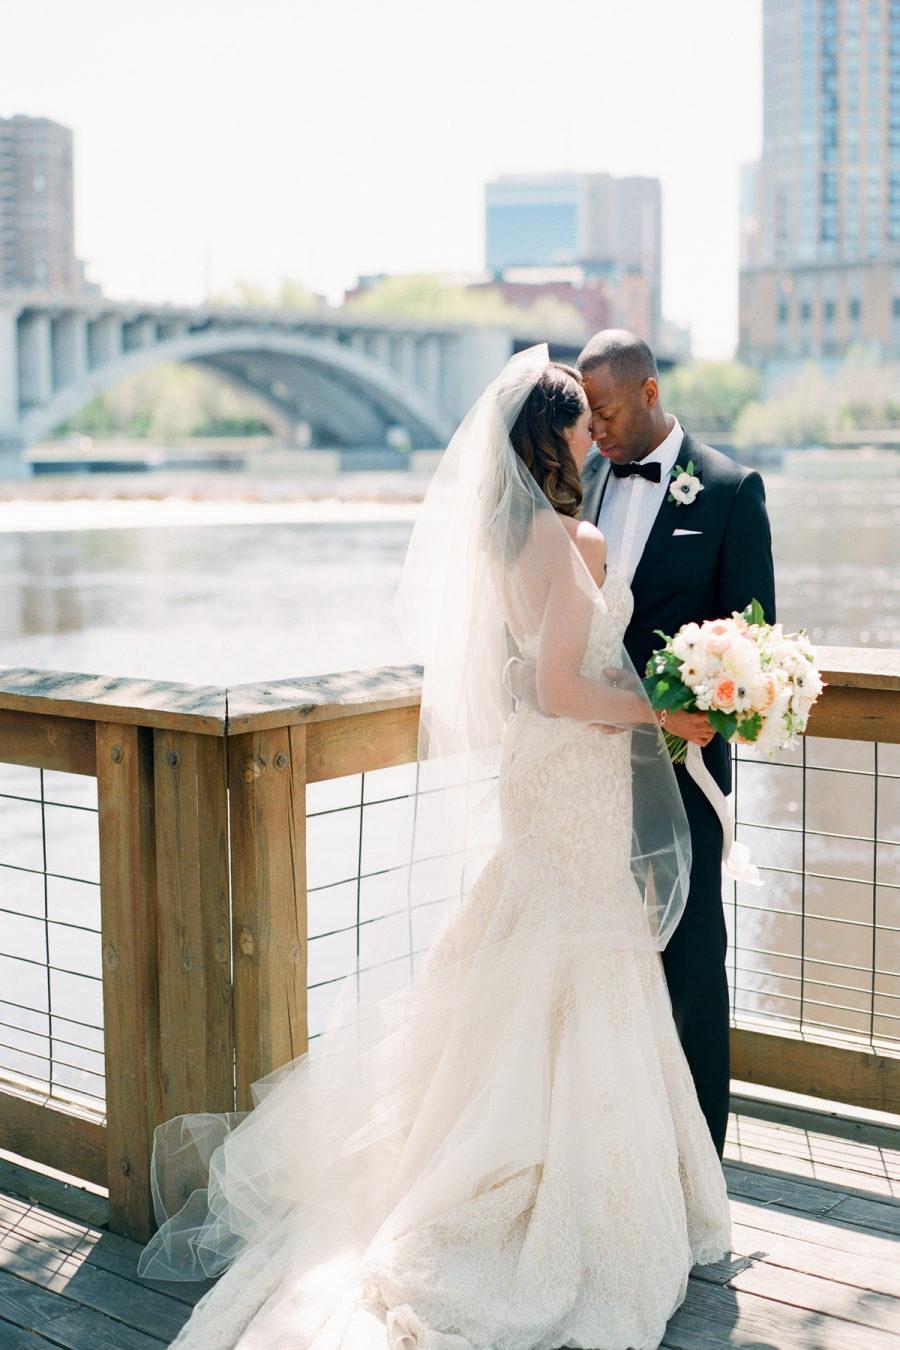 Minneapolis Wedding Dress Shops 49 Good